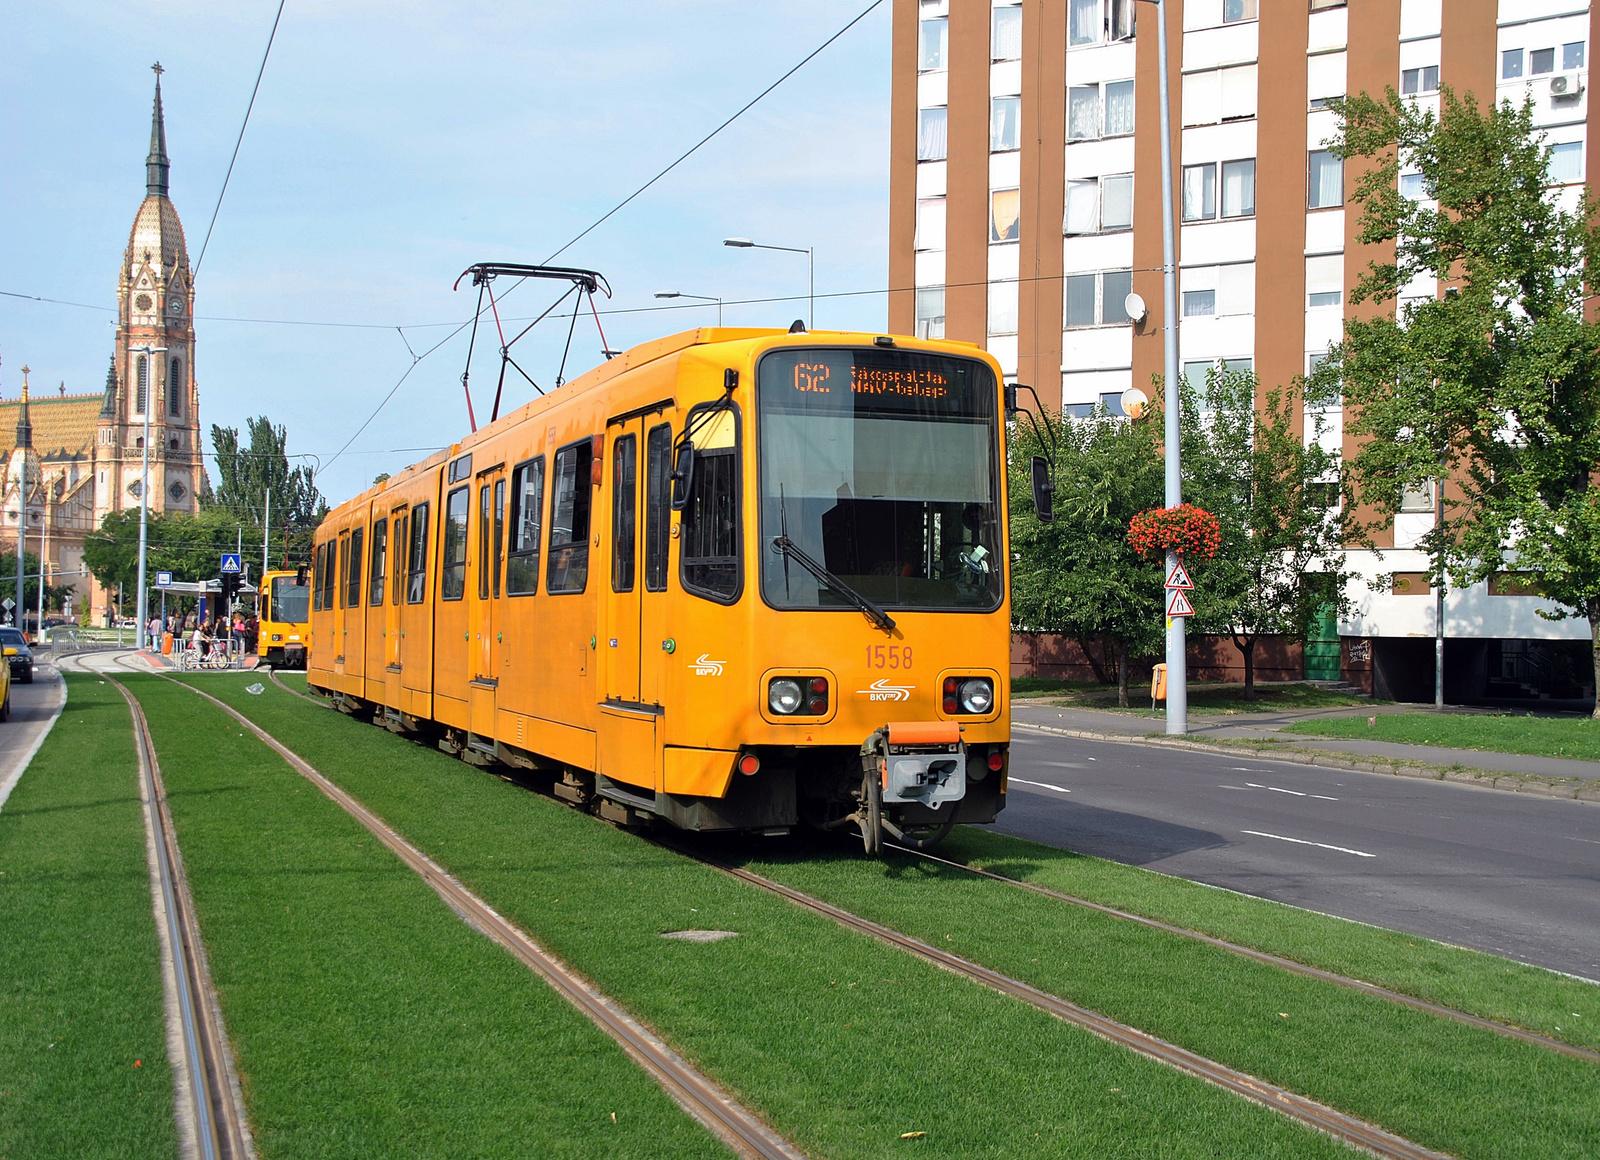 Zöld úton a sárga villamos